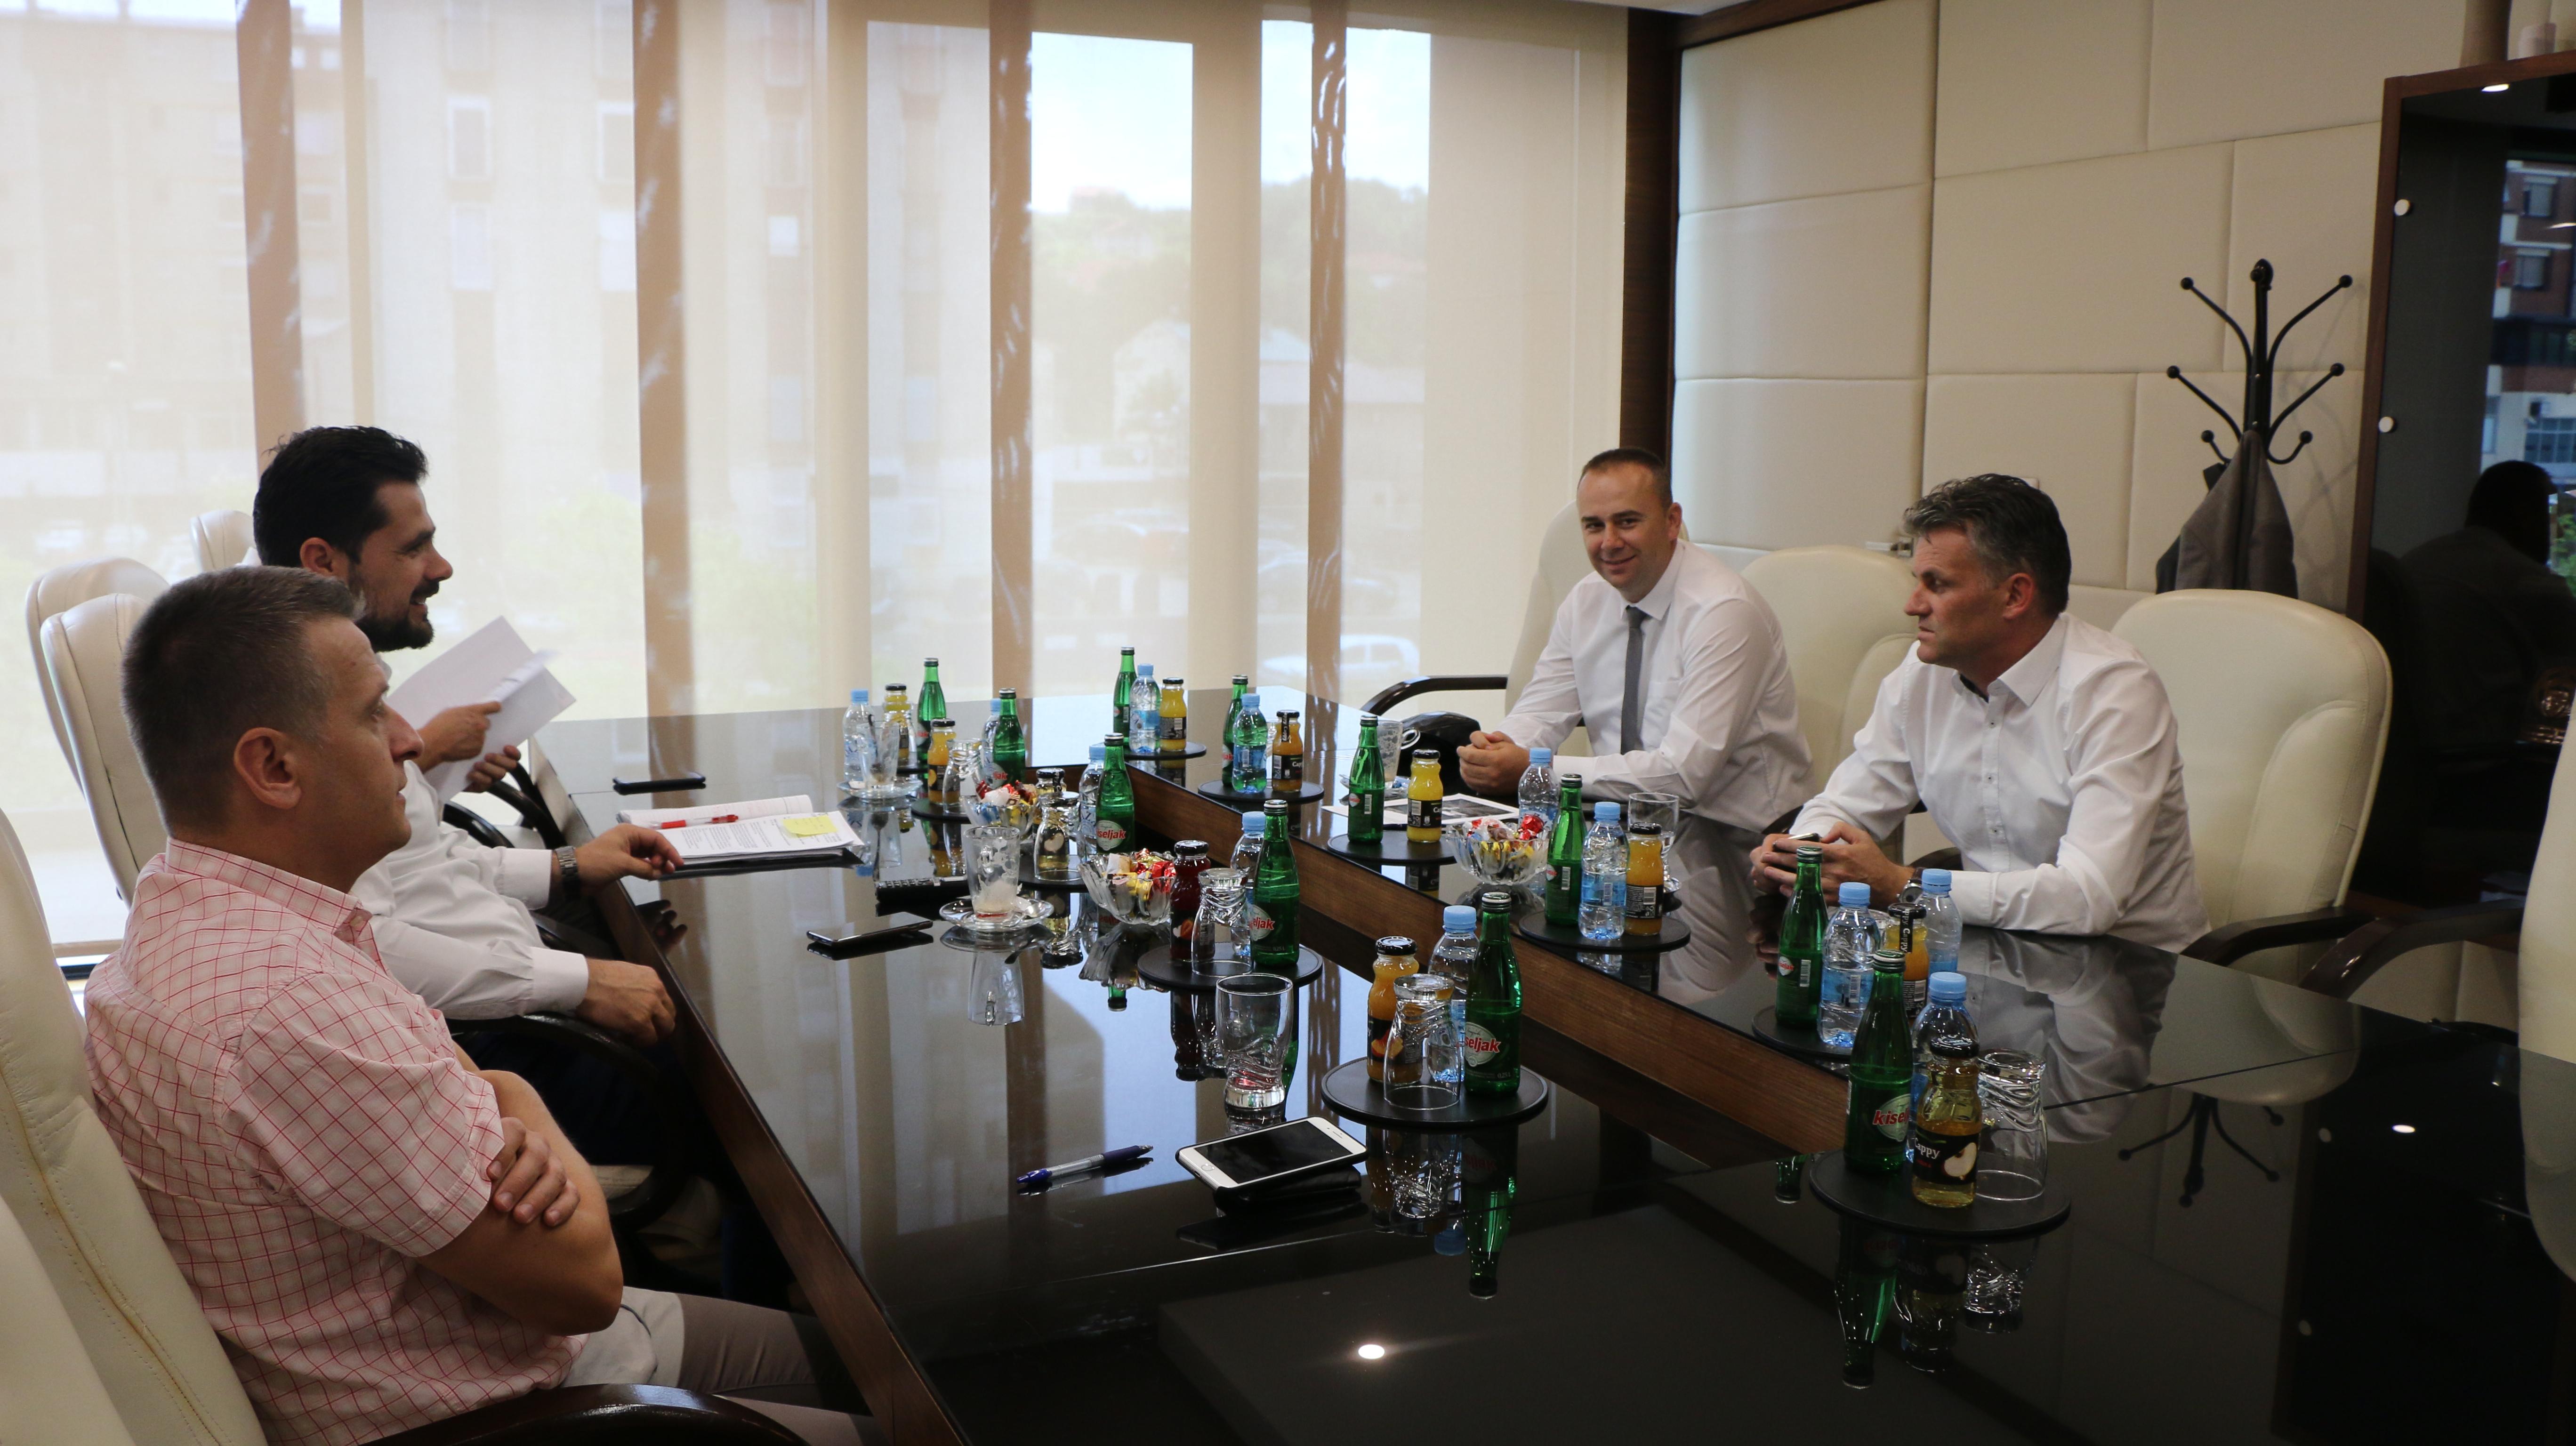 Načelnik Aldin Šljivo razgovarao s kantonalnim ministrima Mirnesom Bašićem i Fahrudinom Čolakovićem